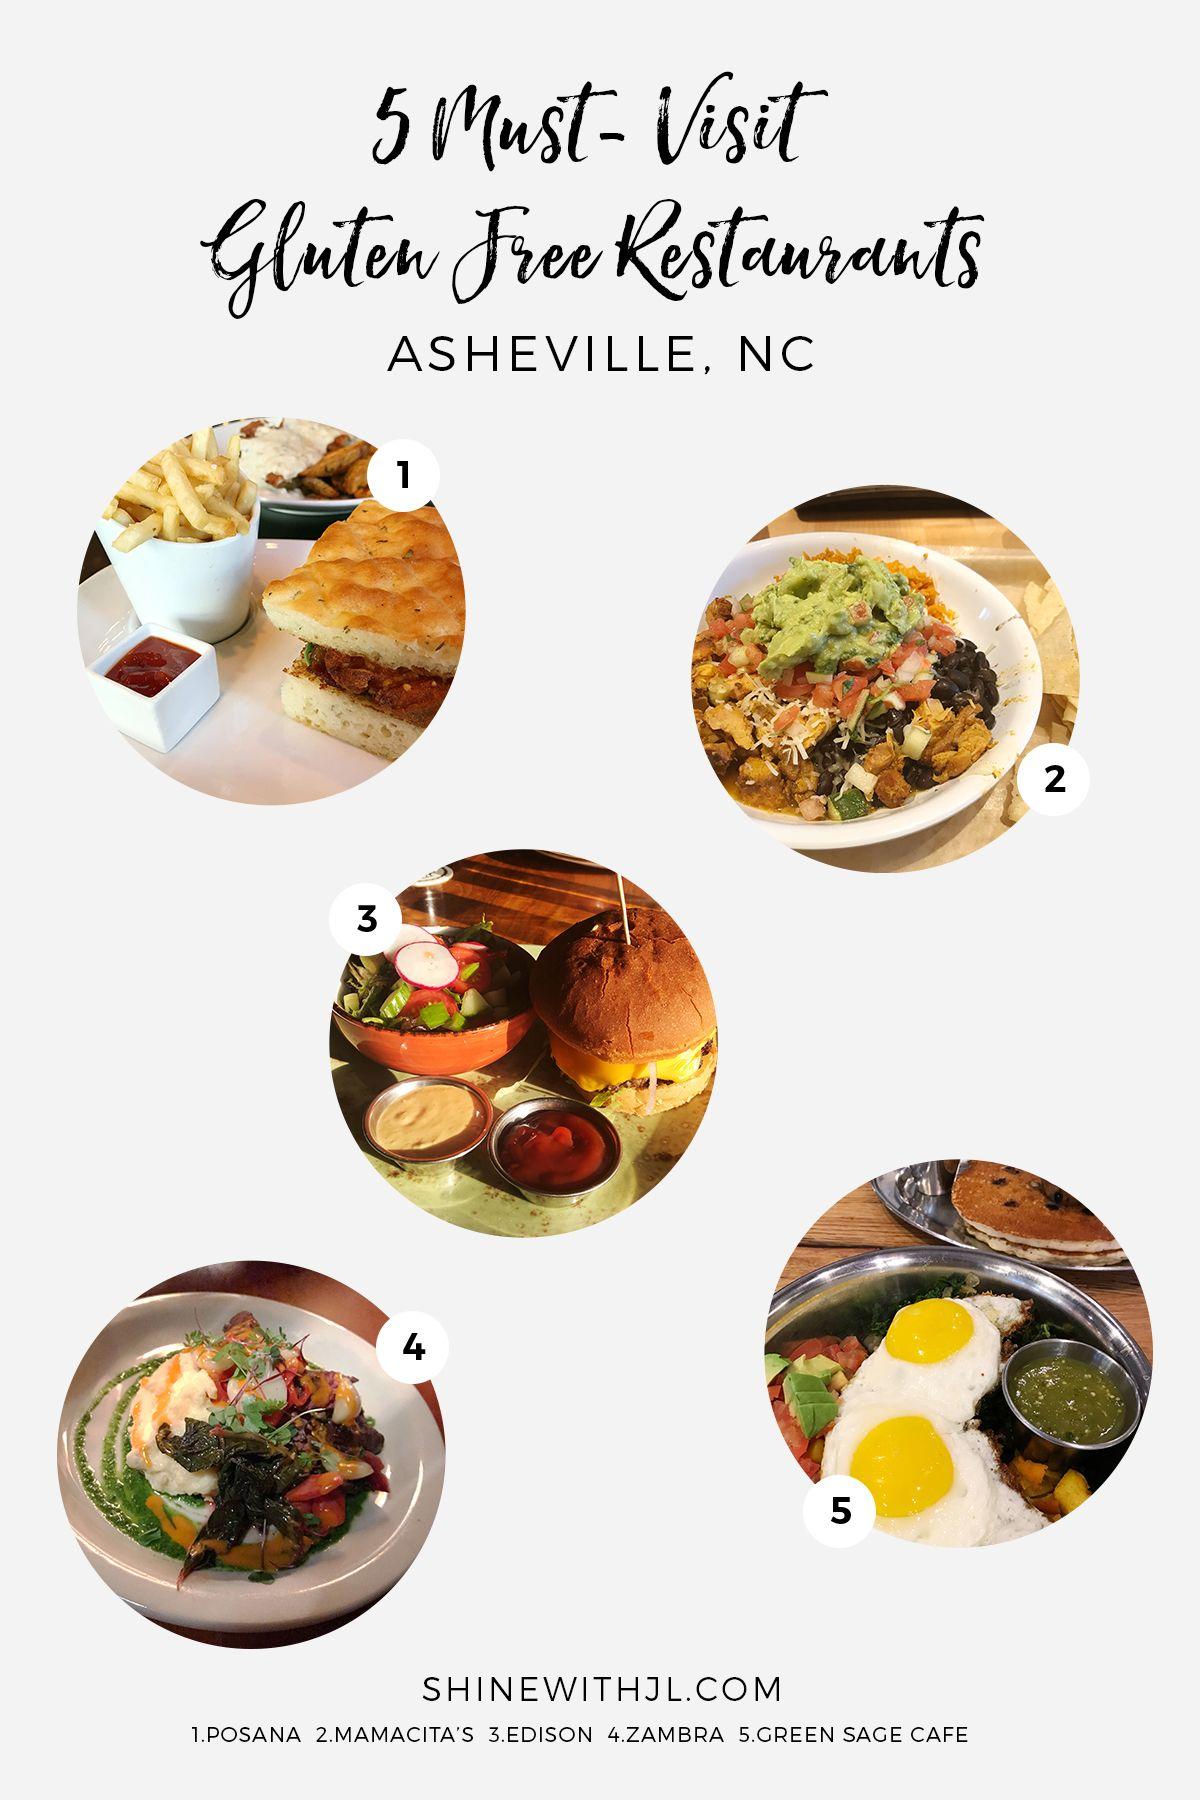 5 Must Visit Gluten Free Restaurants In Asheville Nc Posana Mamacita S Mexican Grill Gluten Free Restaurants Gluten Free Restaurant Menus Gluten Free Travel